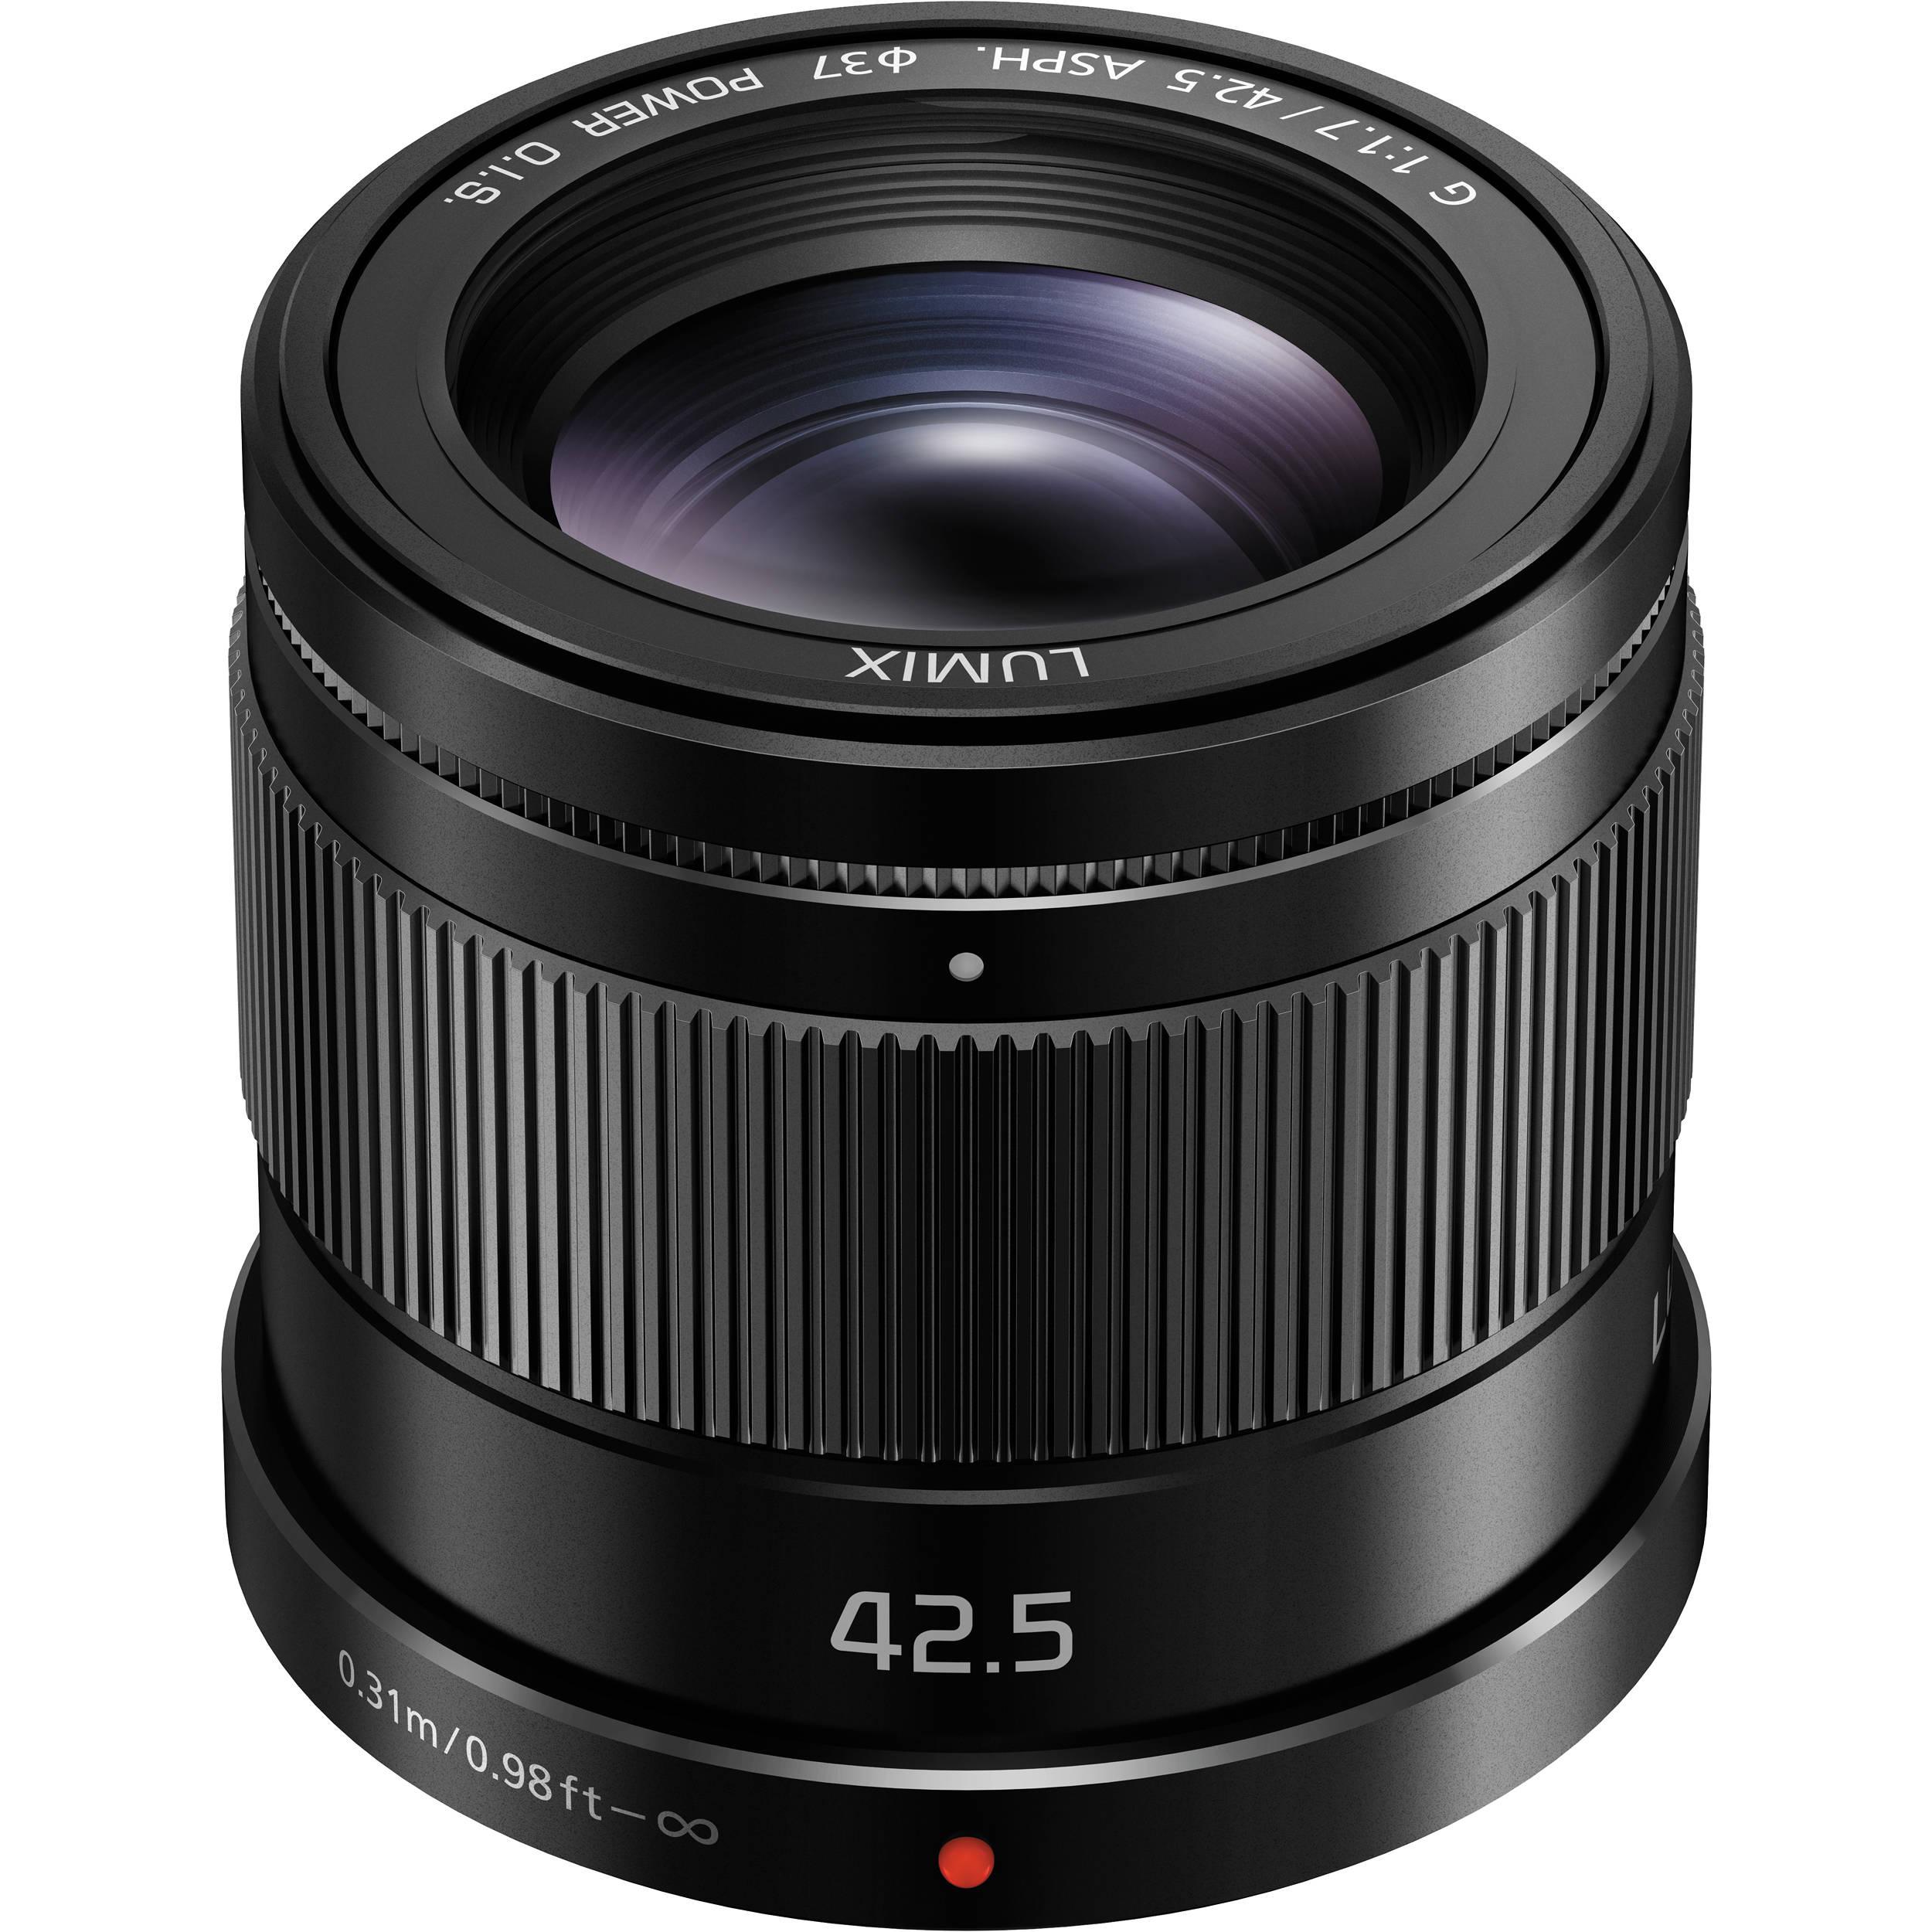 Drivers for Olympus Digital Camera H-HS043 Lens